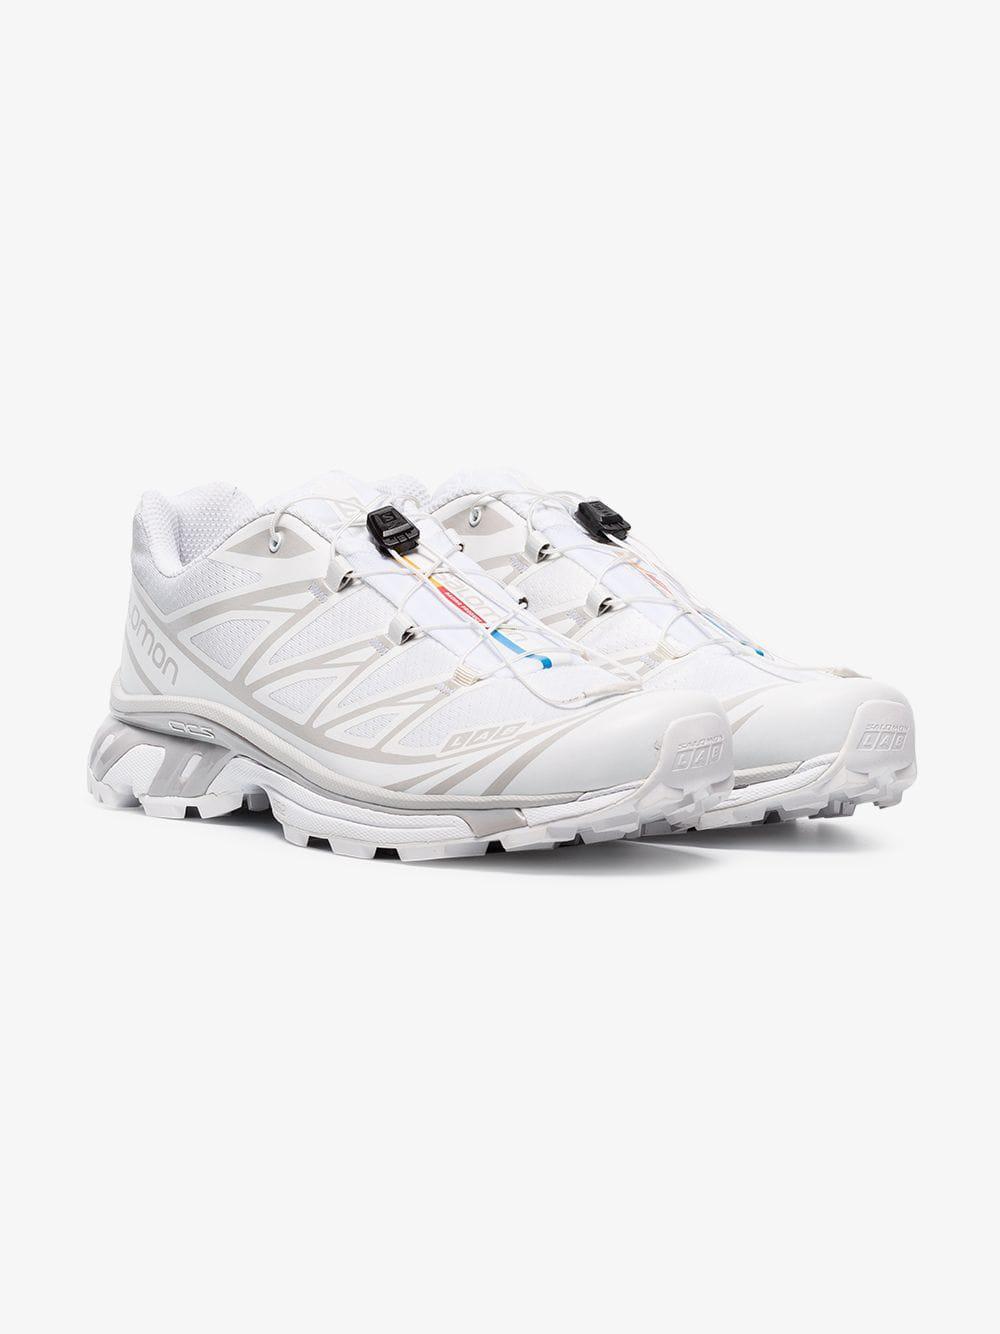 quality design 99d30 d9194 switzerland salomon s lab white xt 6 adv sneakers for men lyst. view  fullscreen 87b8b